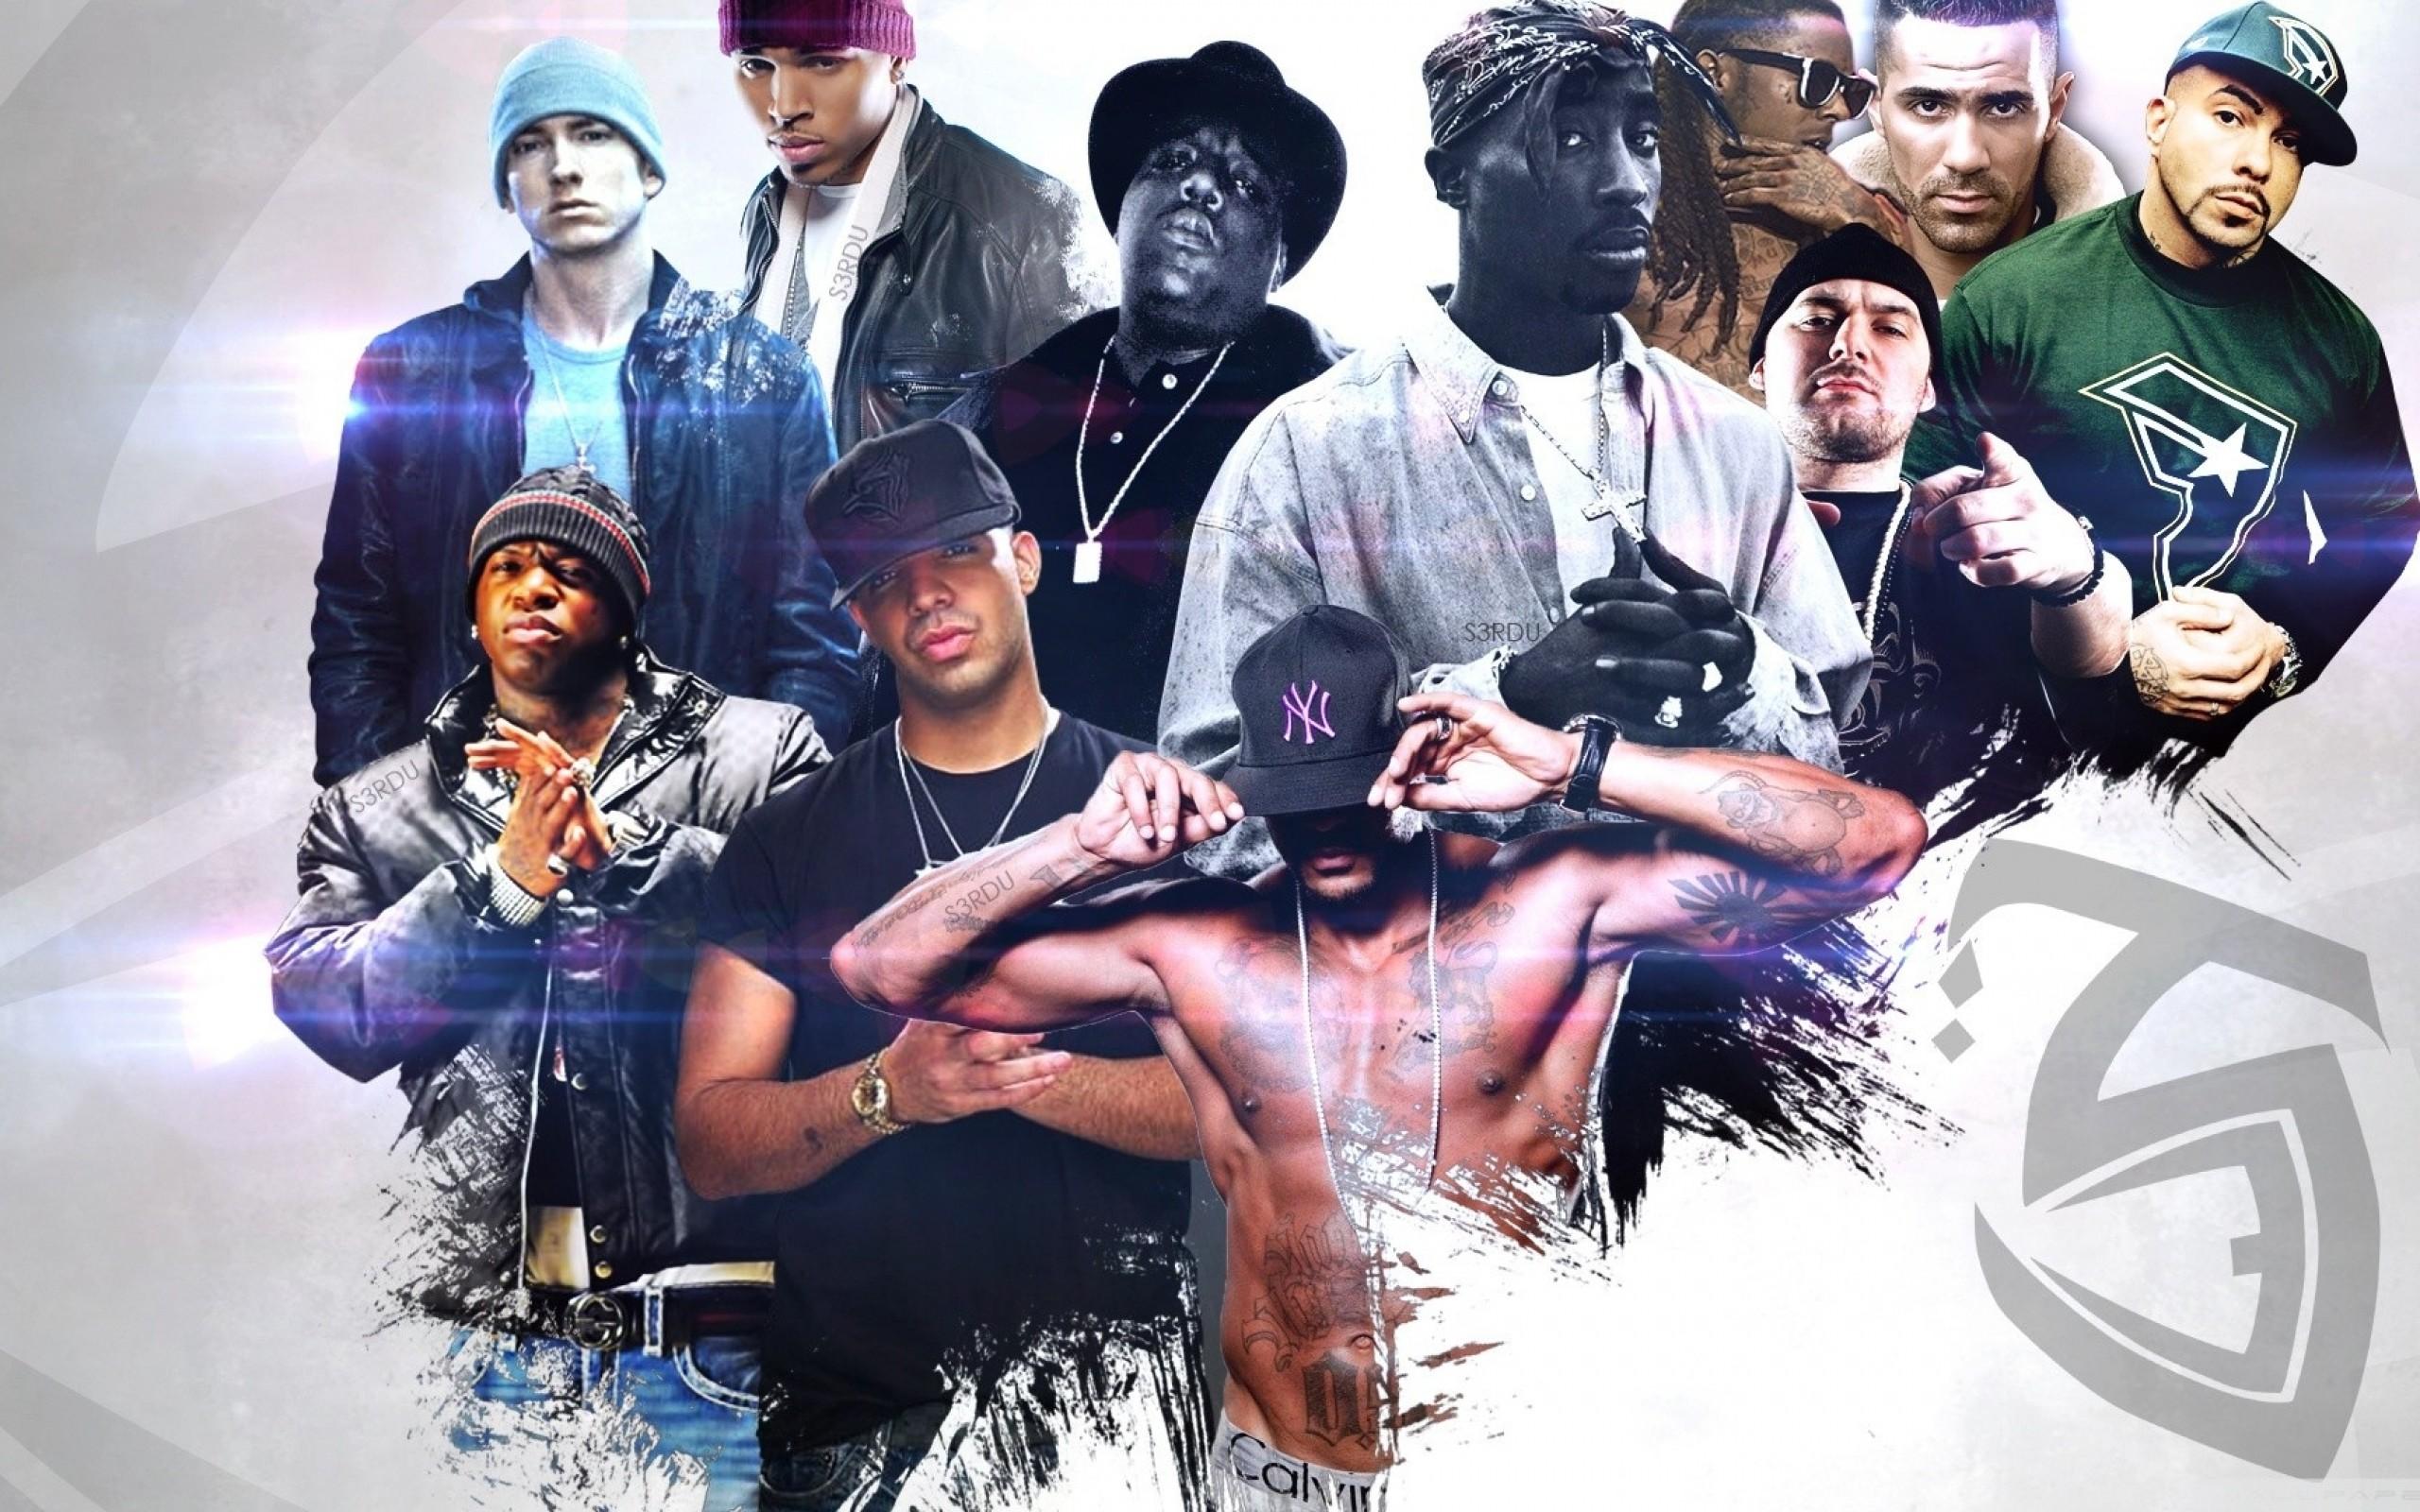 rap 2pac eminem lil wayne notorious big rapper chris brown 1920×1080  wallpaper Art HD Wallpaper